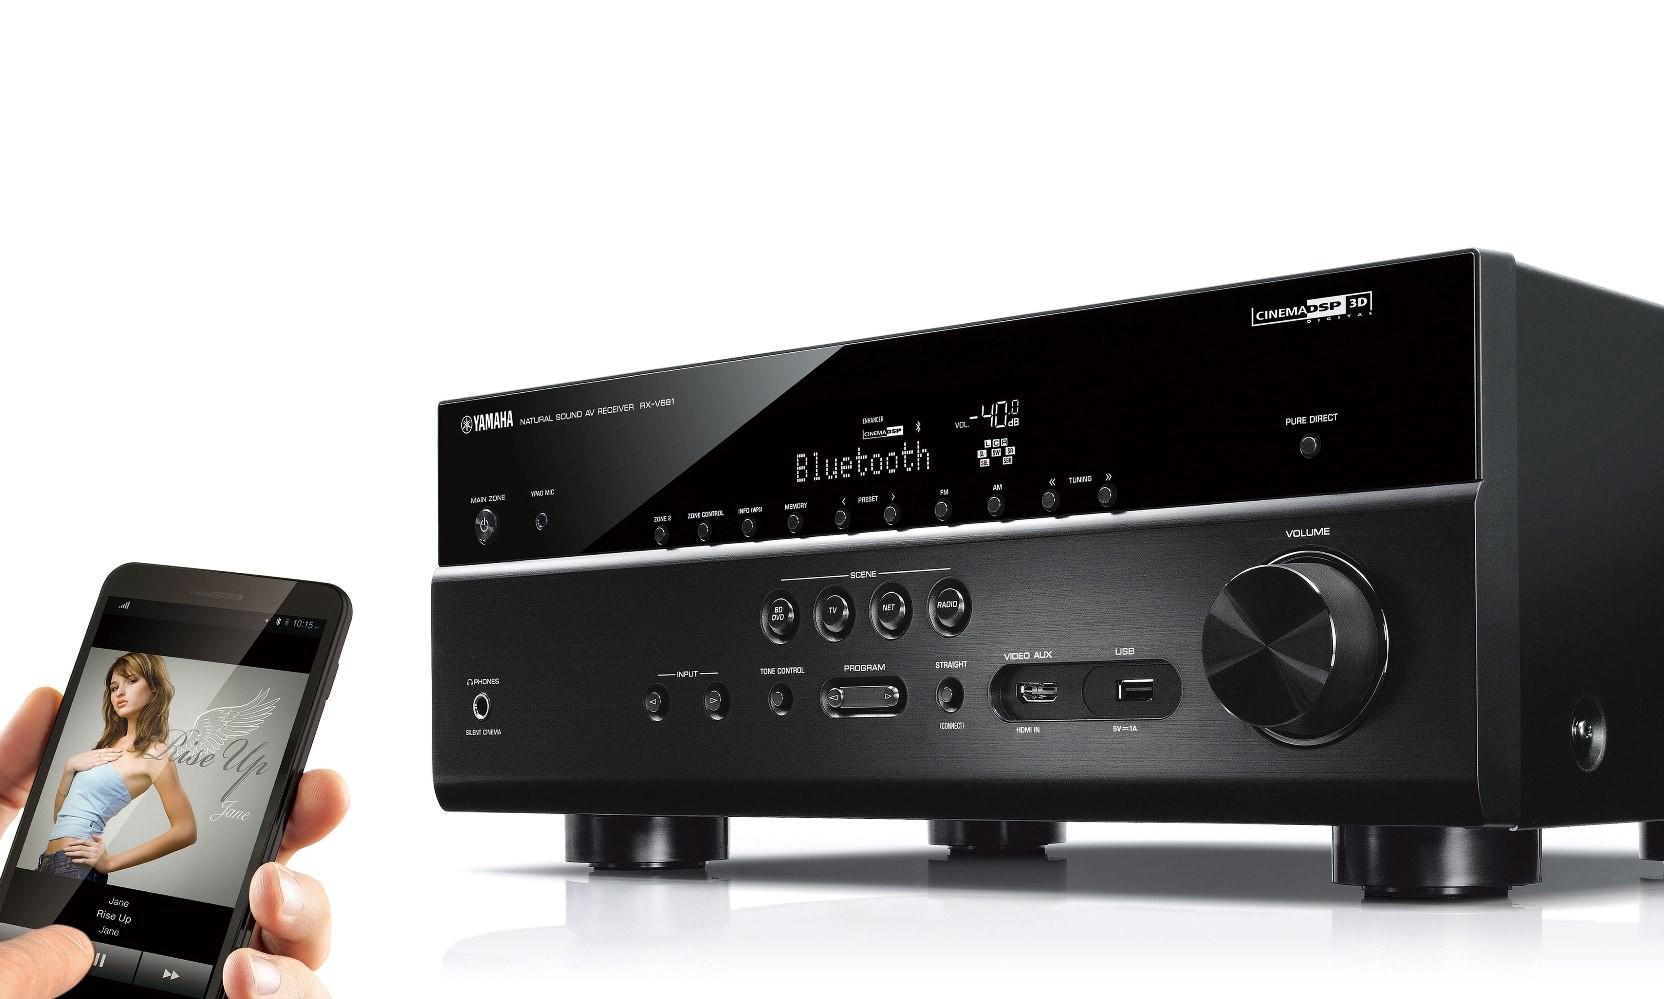 yamaha's latest line of home cinema receivers: rx-vx81 - son-vidéo